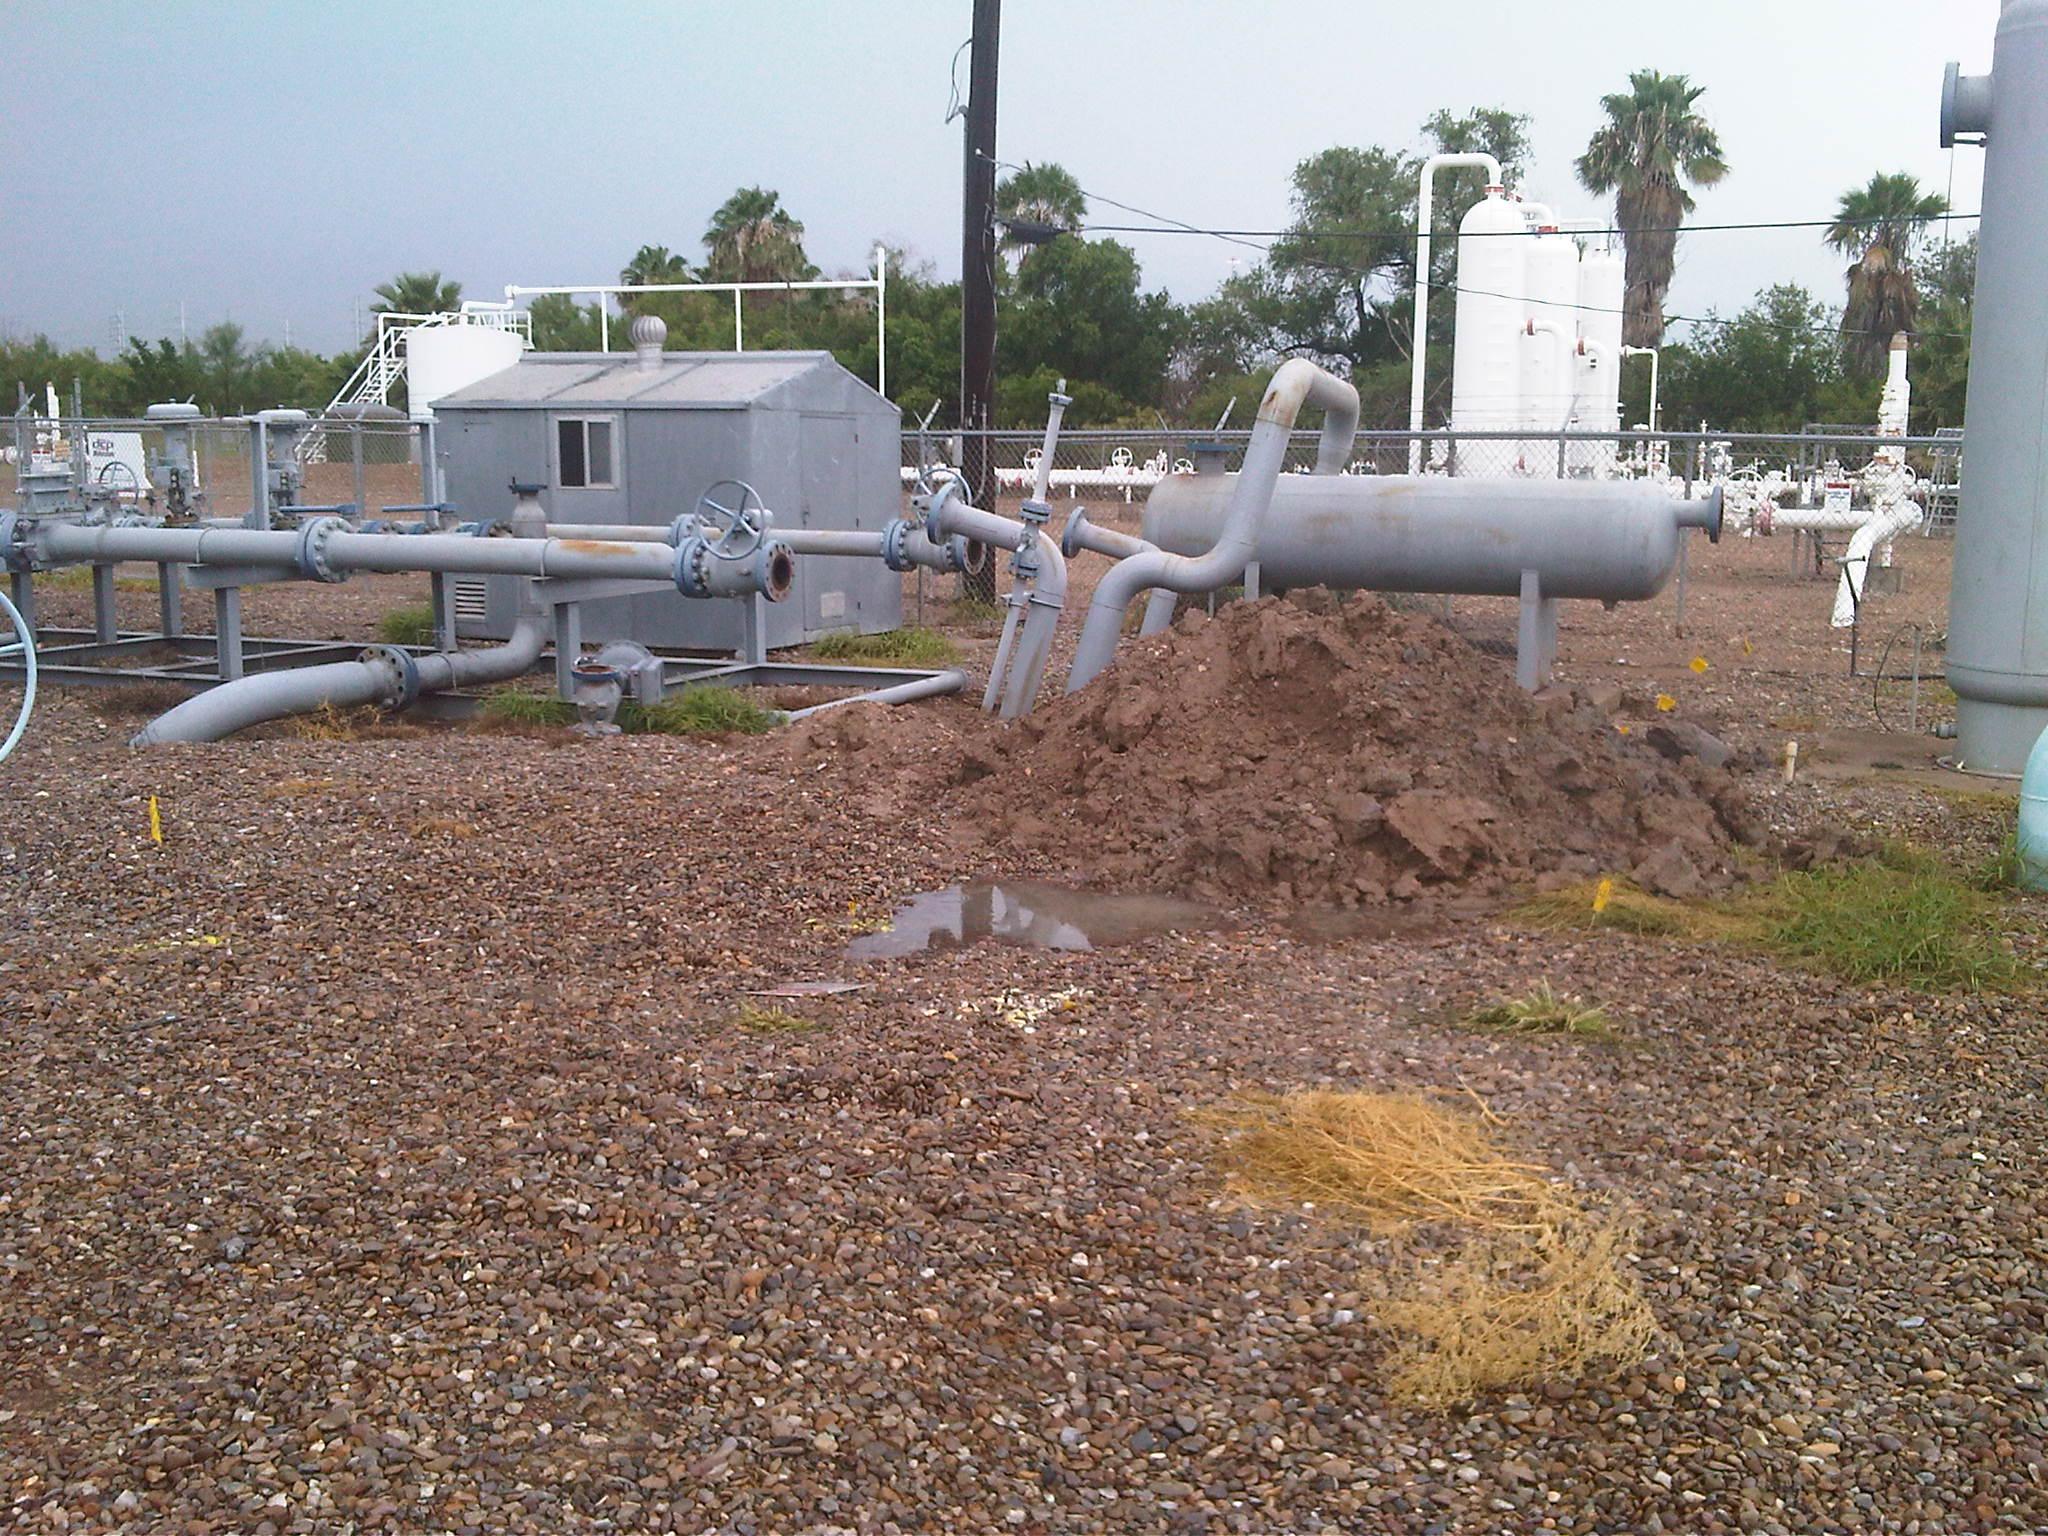 Laredo Gas Yard - Groundwater Investigation